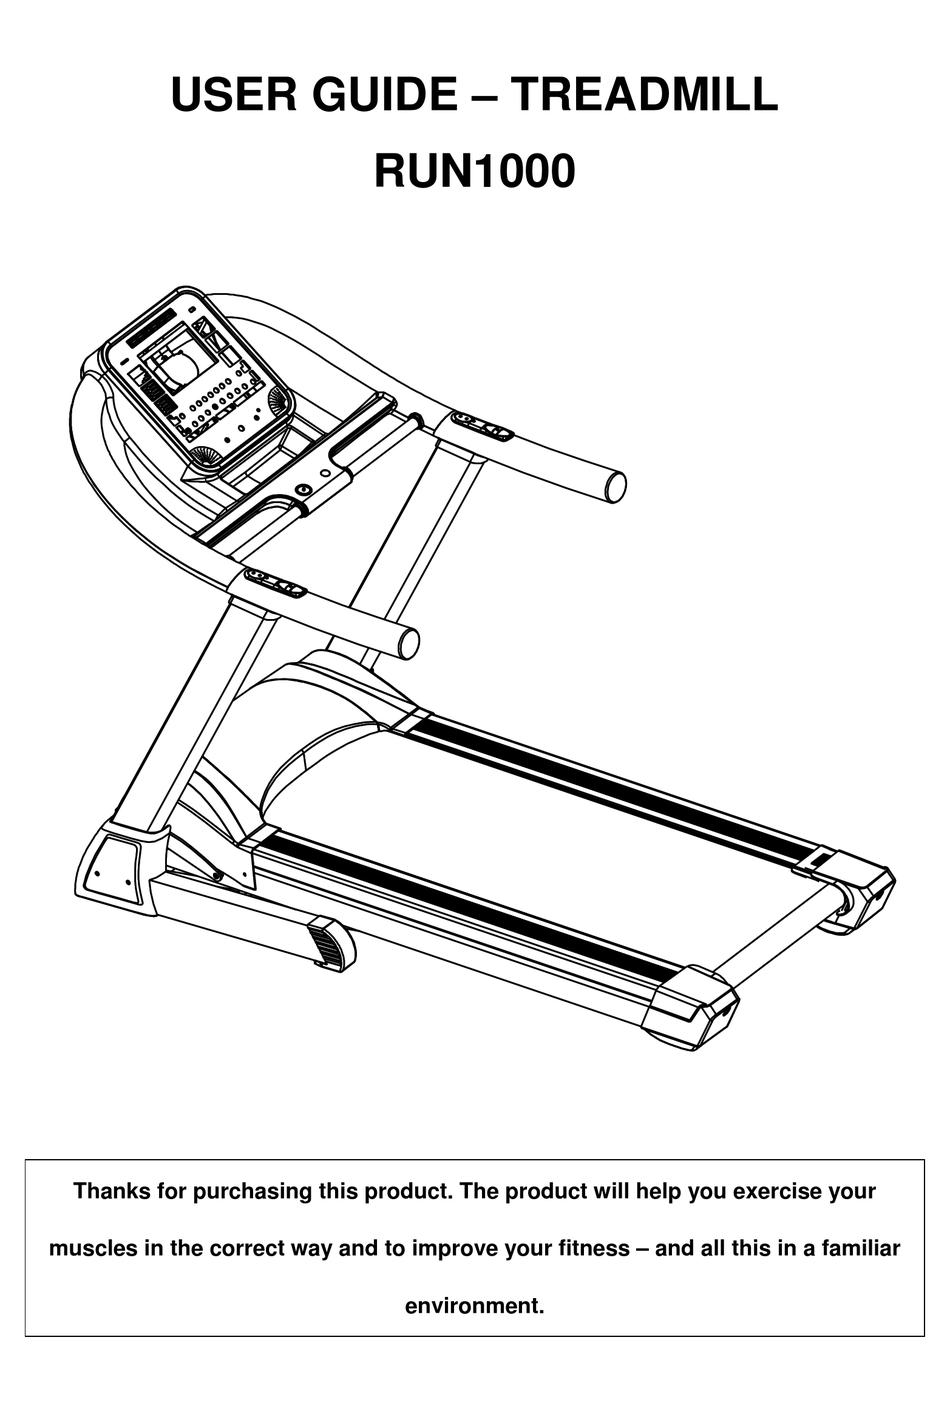 techness run1000 user manual pdf